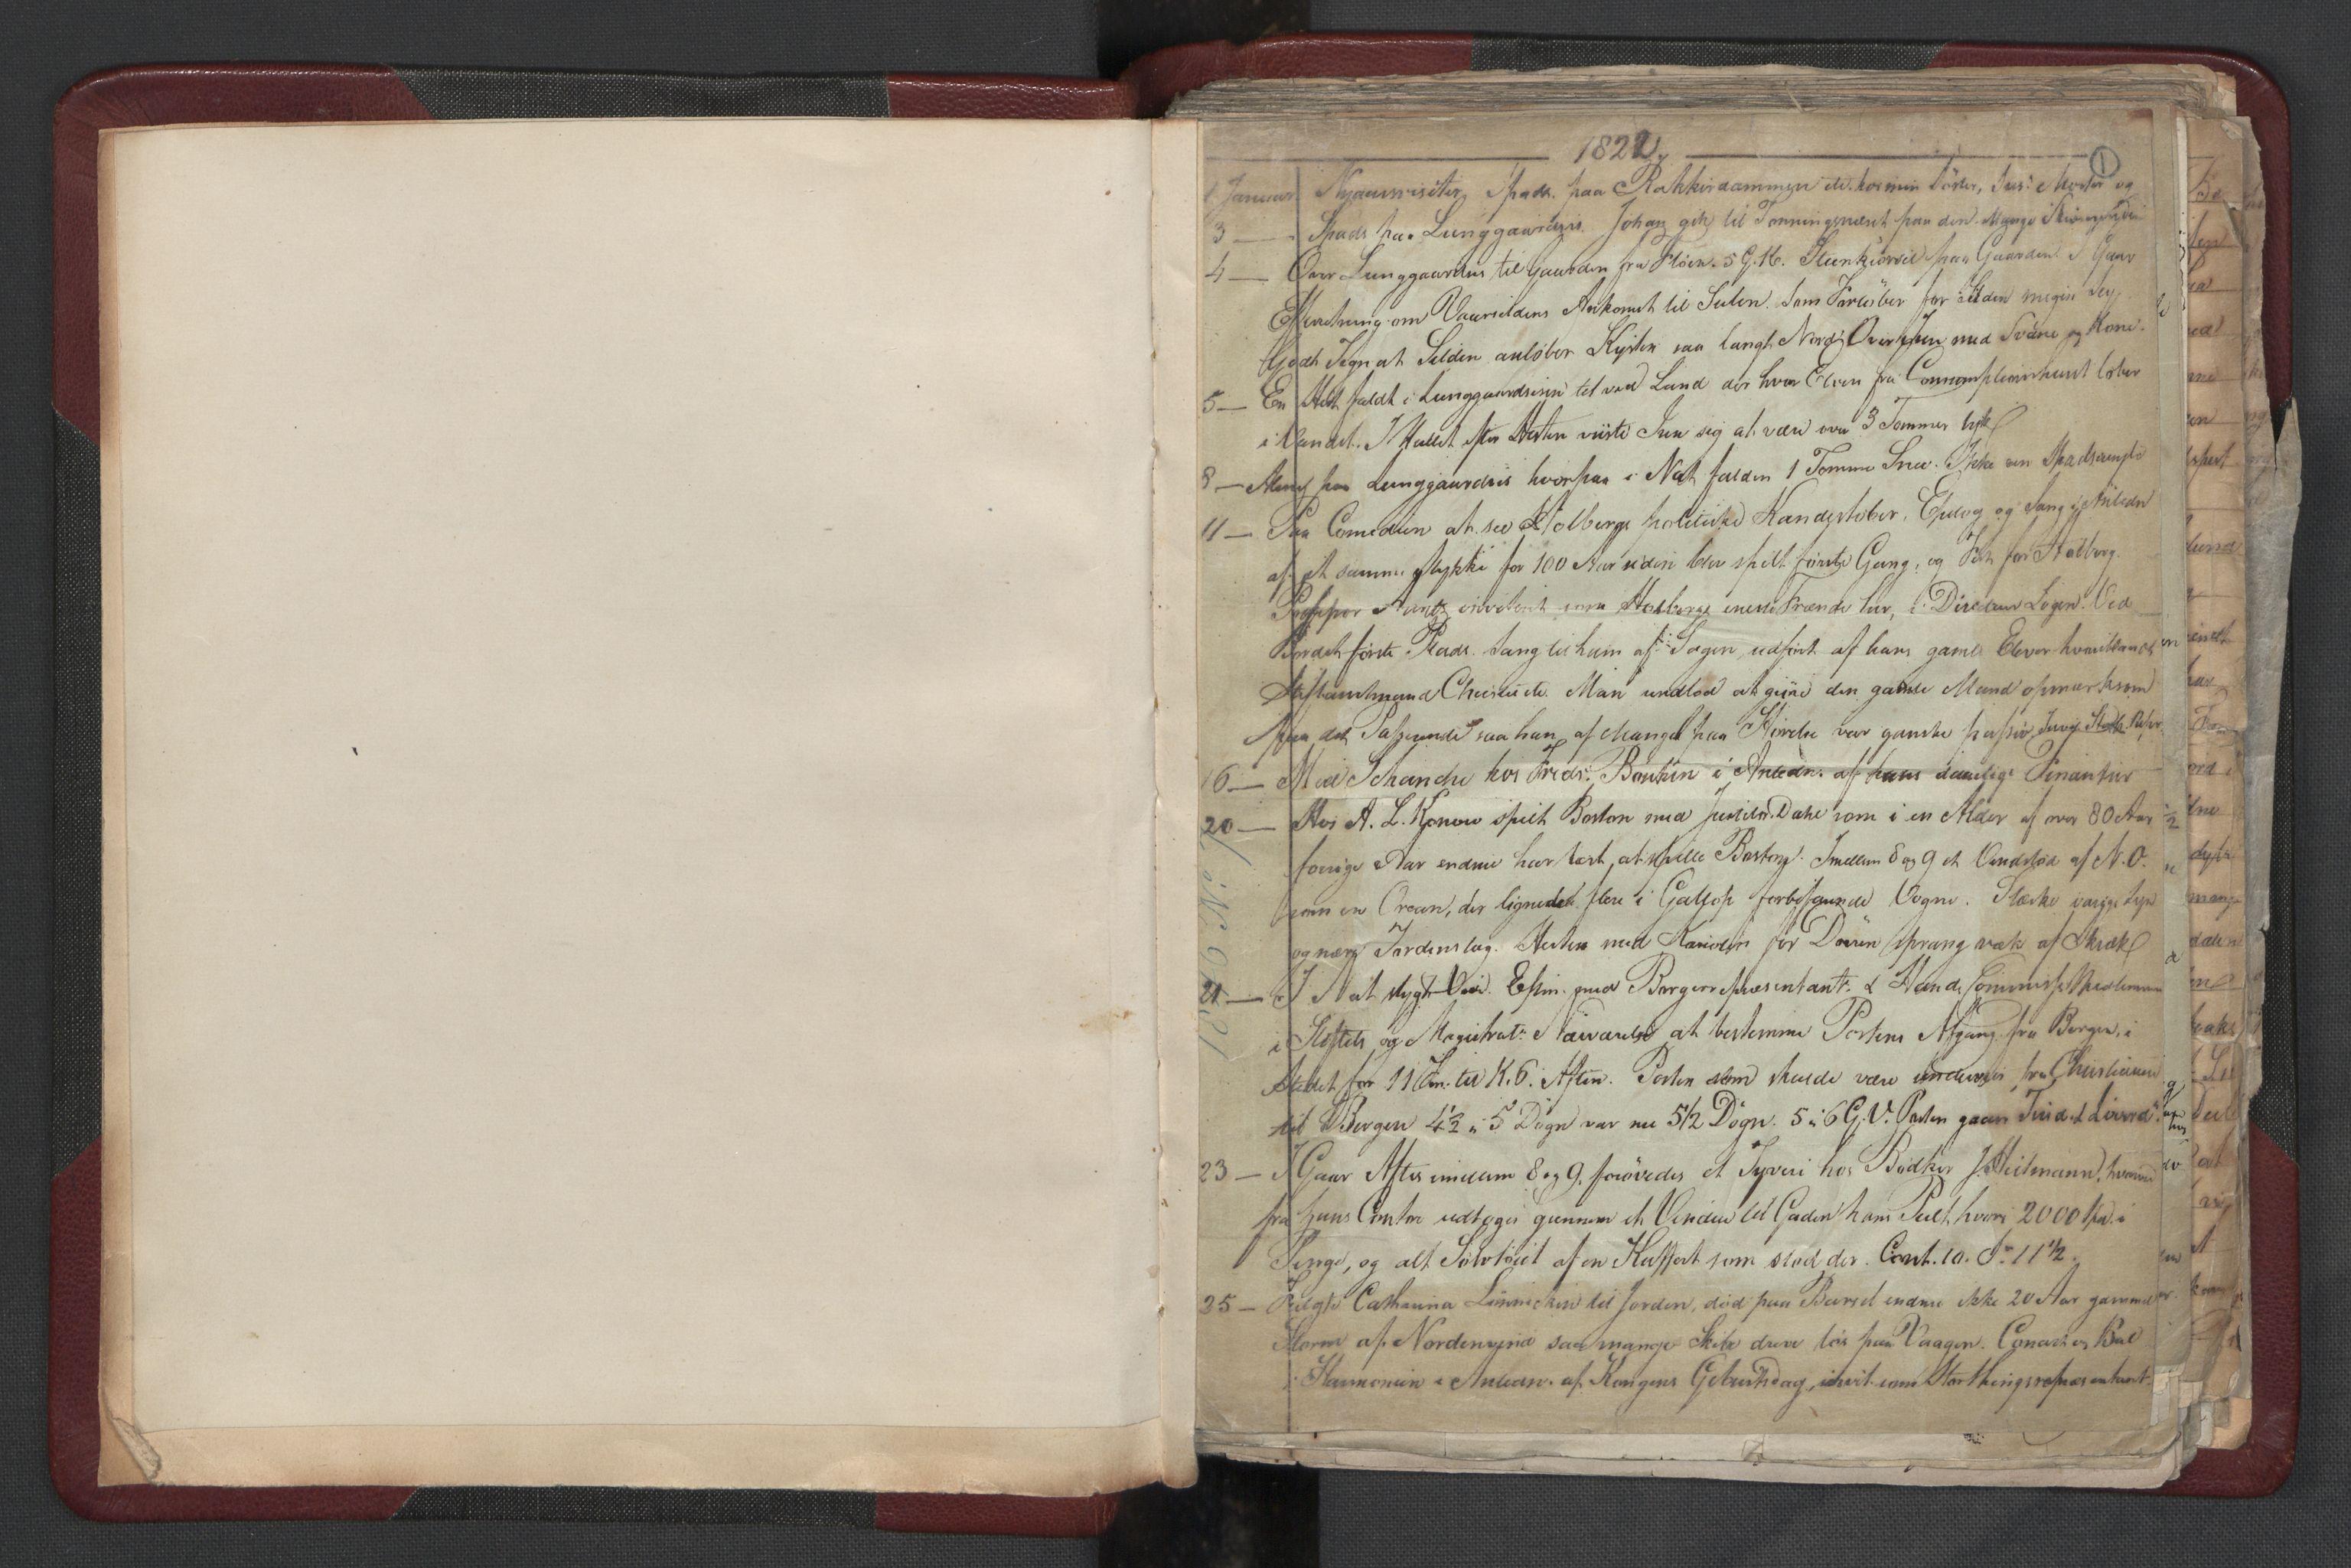 RA, Meltzer, Fredrik, F/L0004: Dagbok, 1822-1830, s. 1a